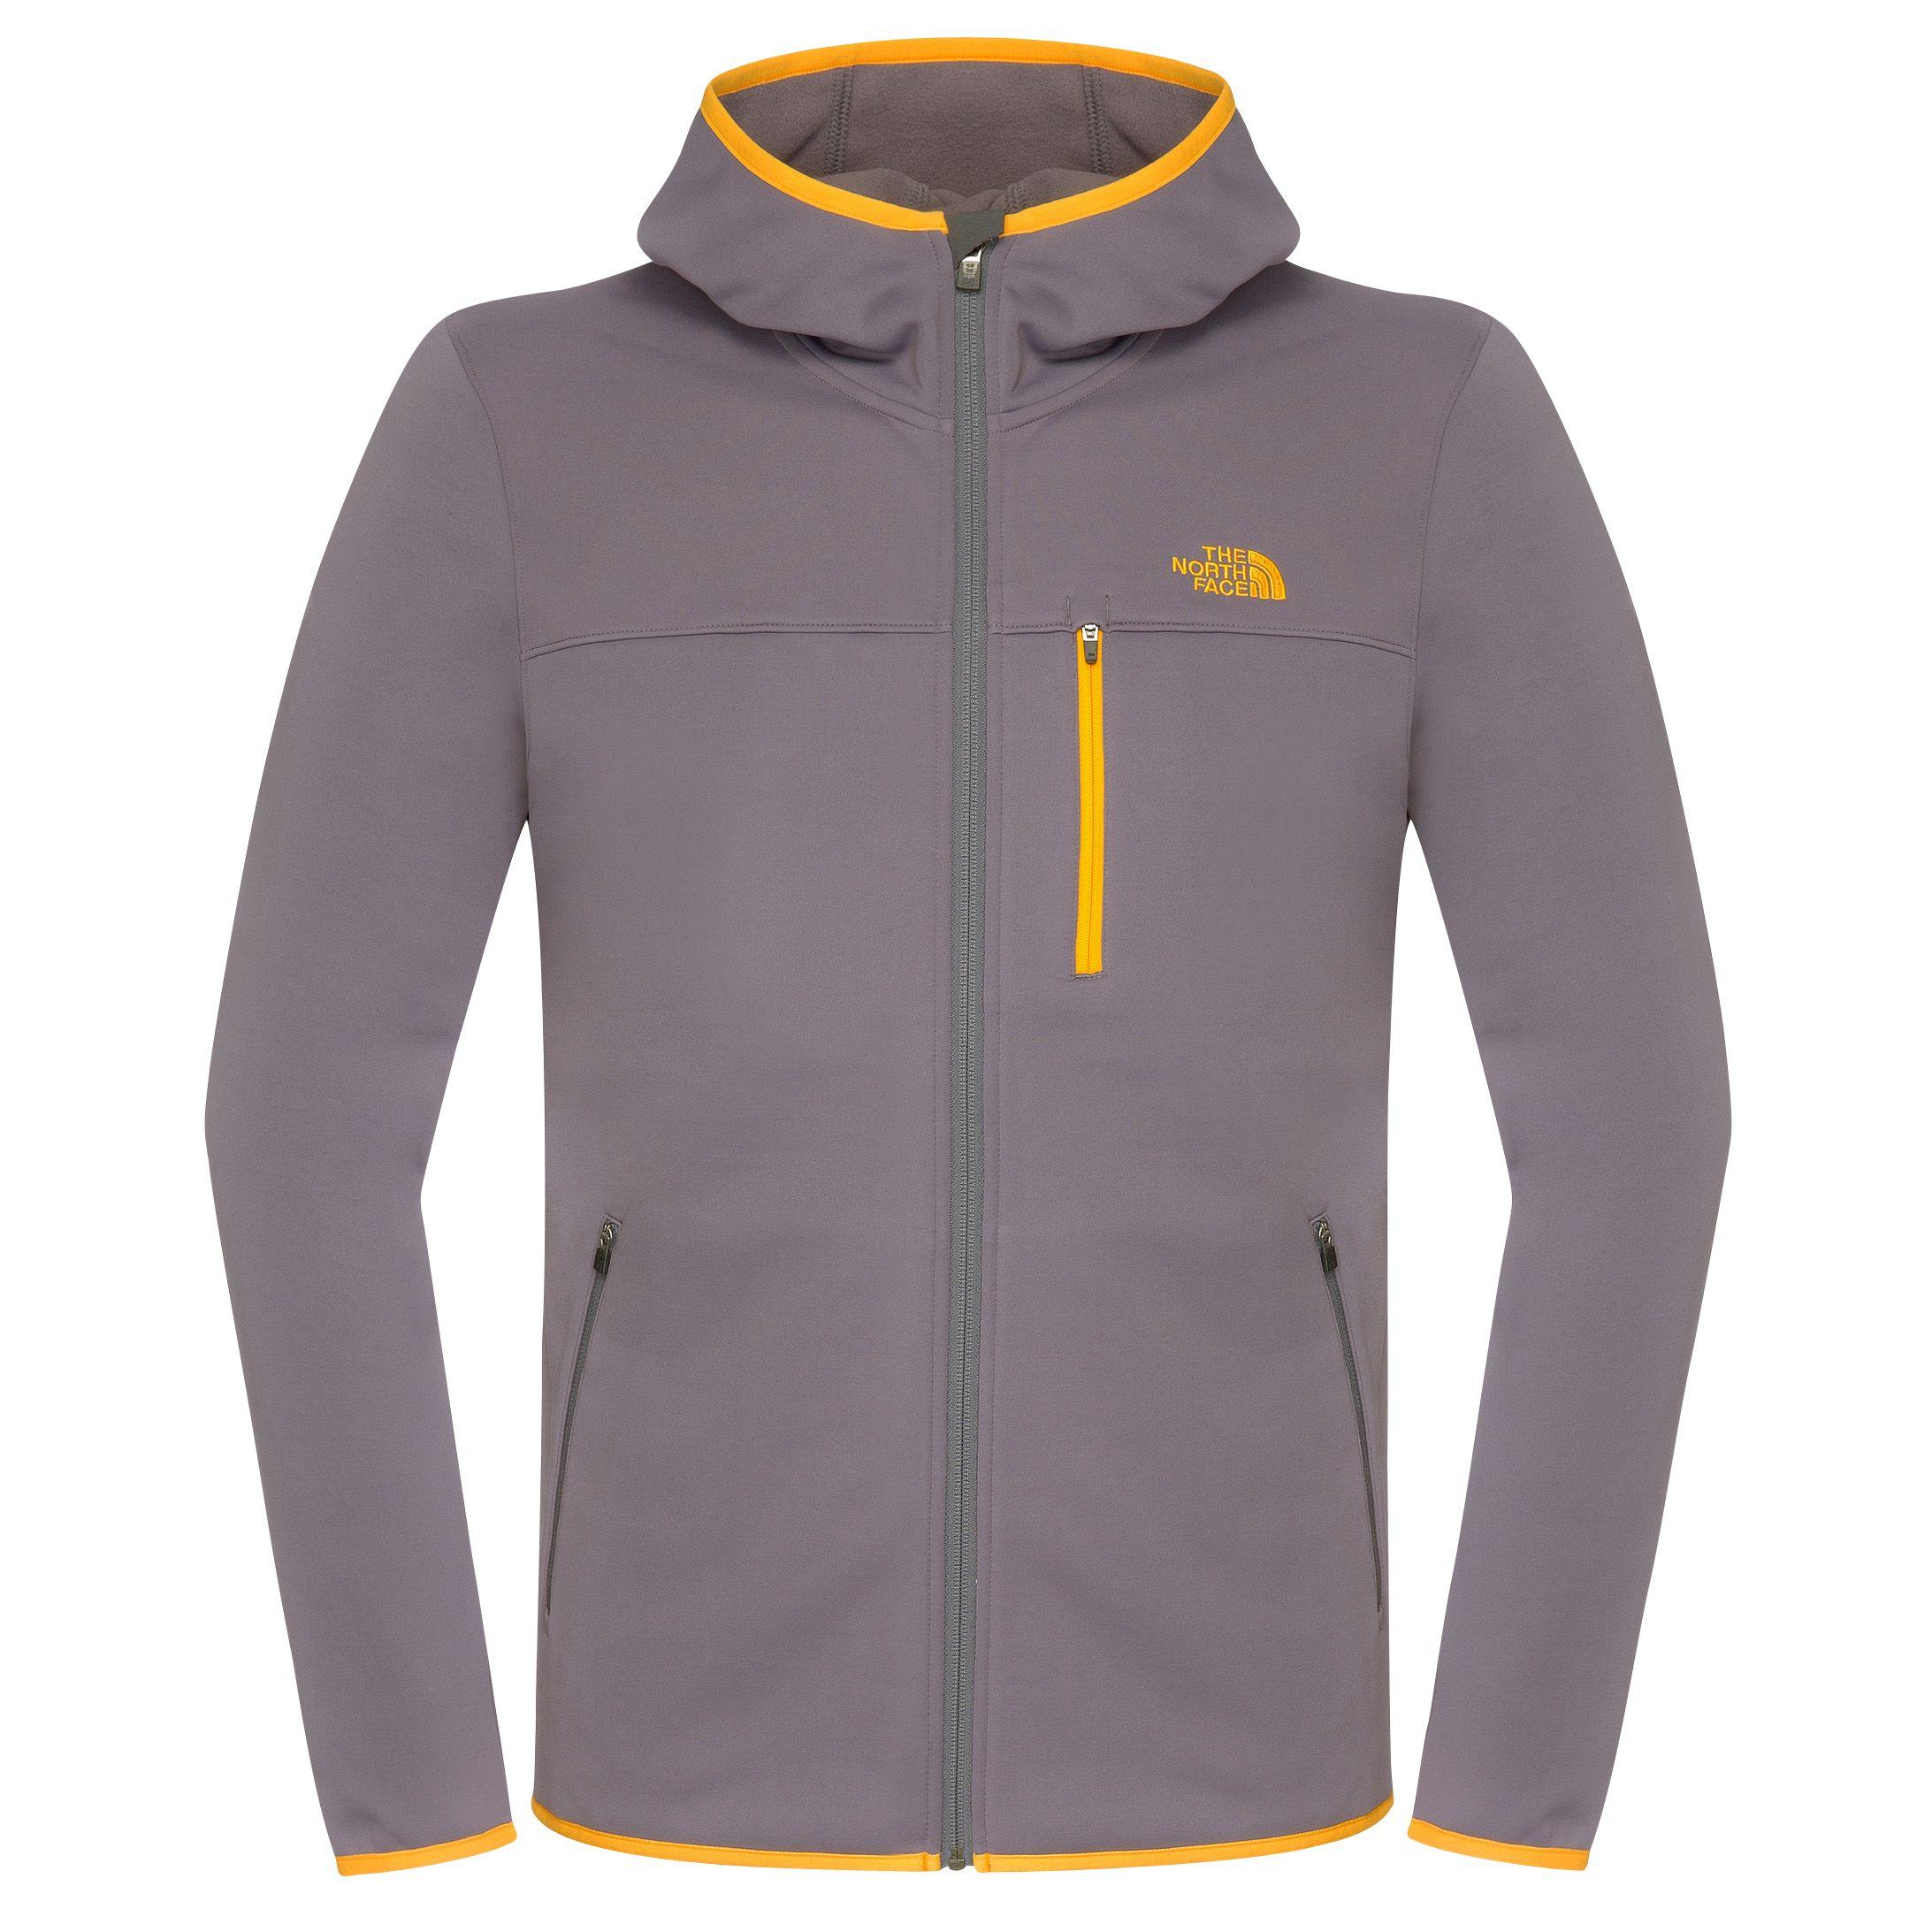 beb087936 The North Face Men's Lixus Full Zip Hoodie Jacket, Vandis Grey at ...